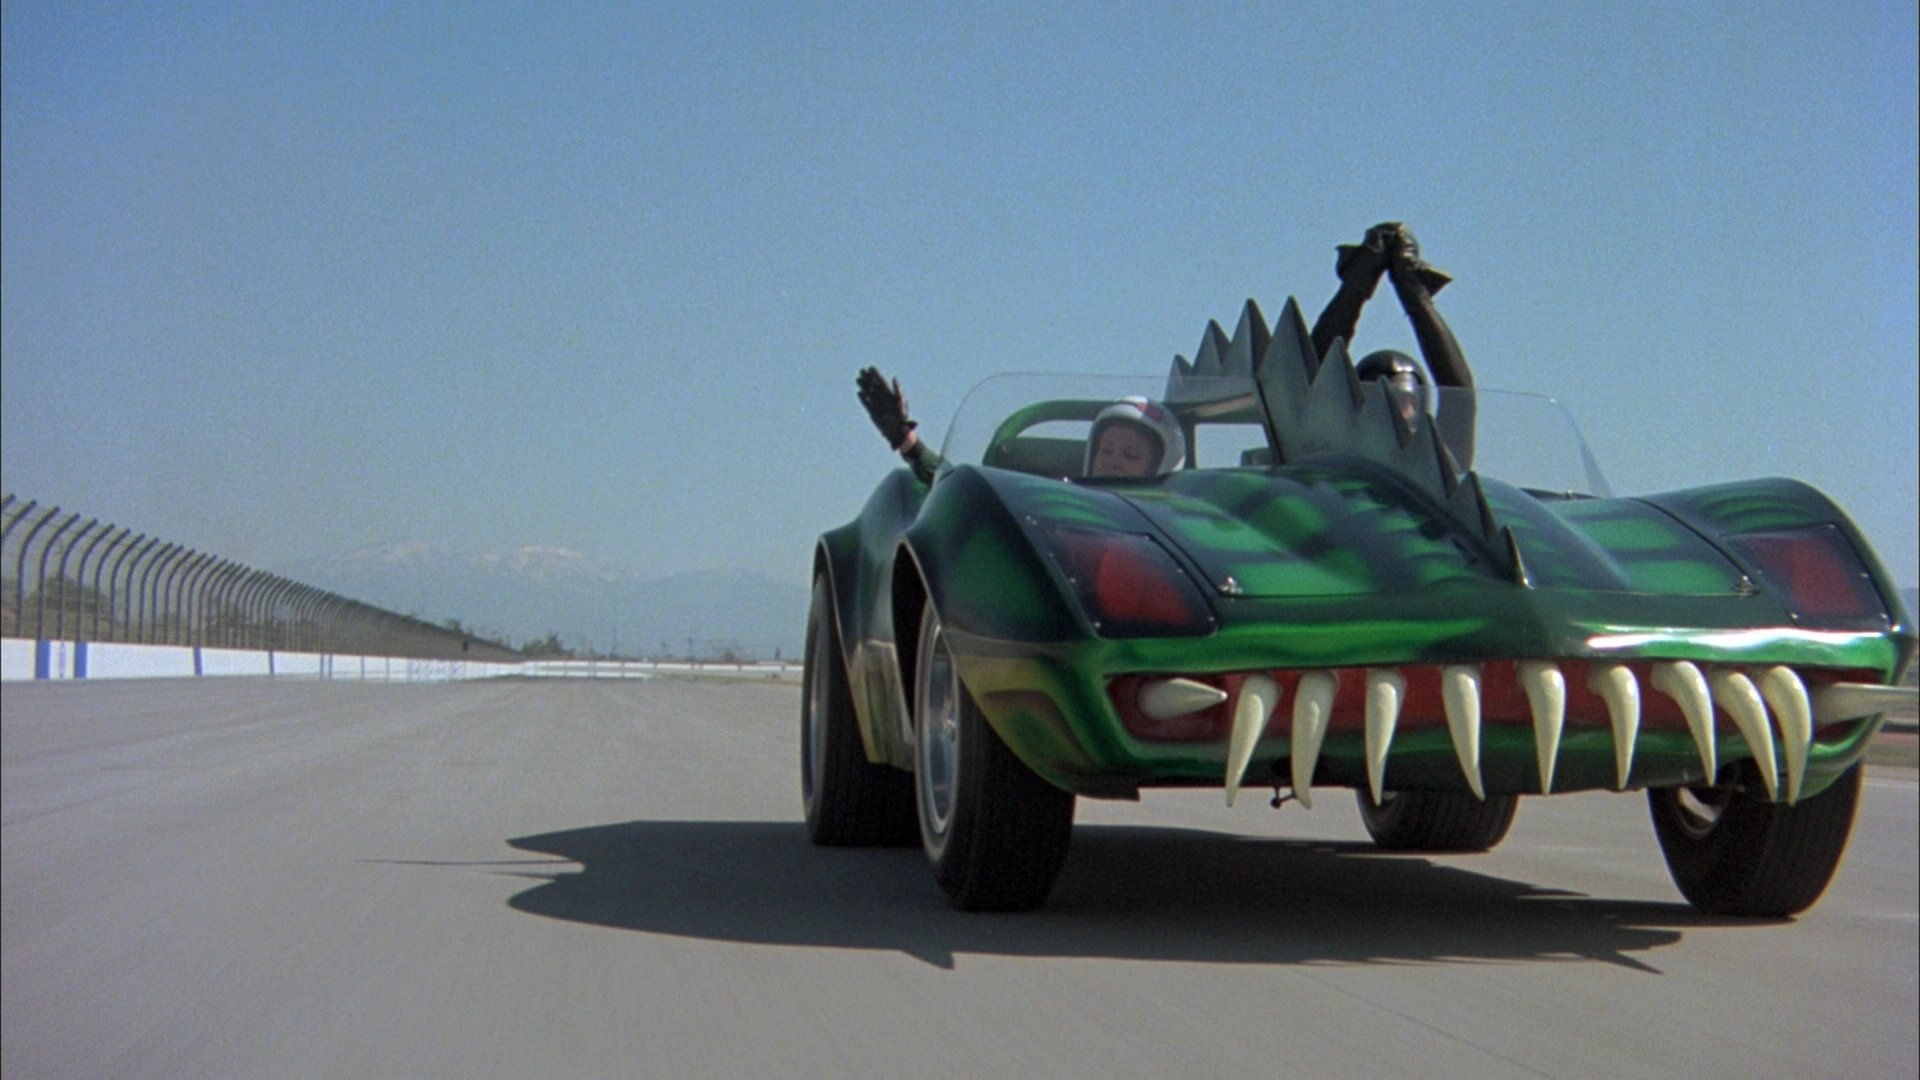 3840x1080 Wallpaper Cars Reddut Death Race 2000 Hd Wallpaper Background Image